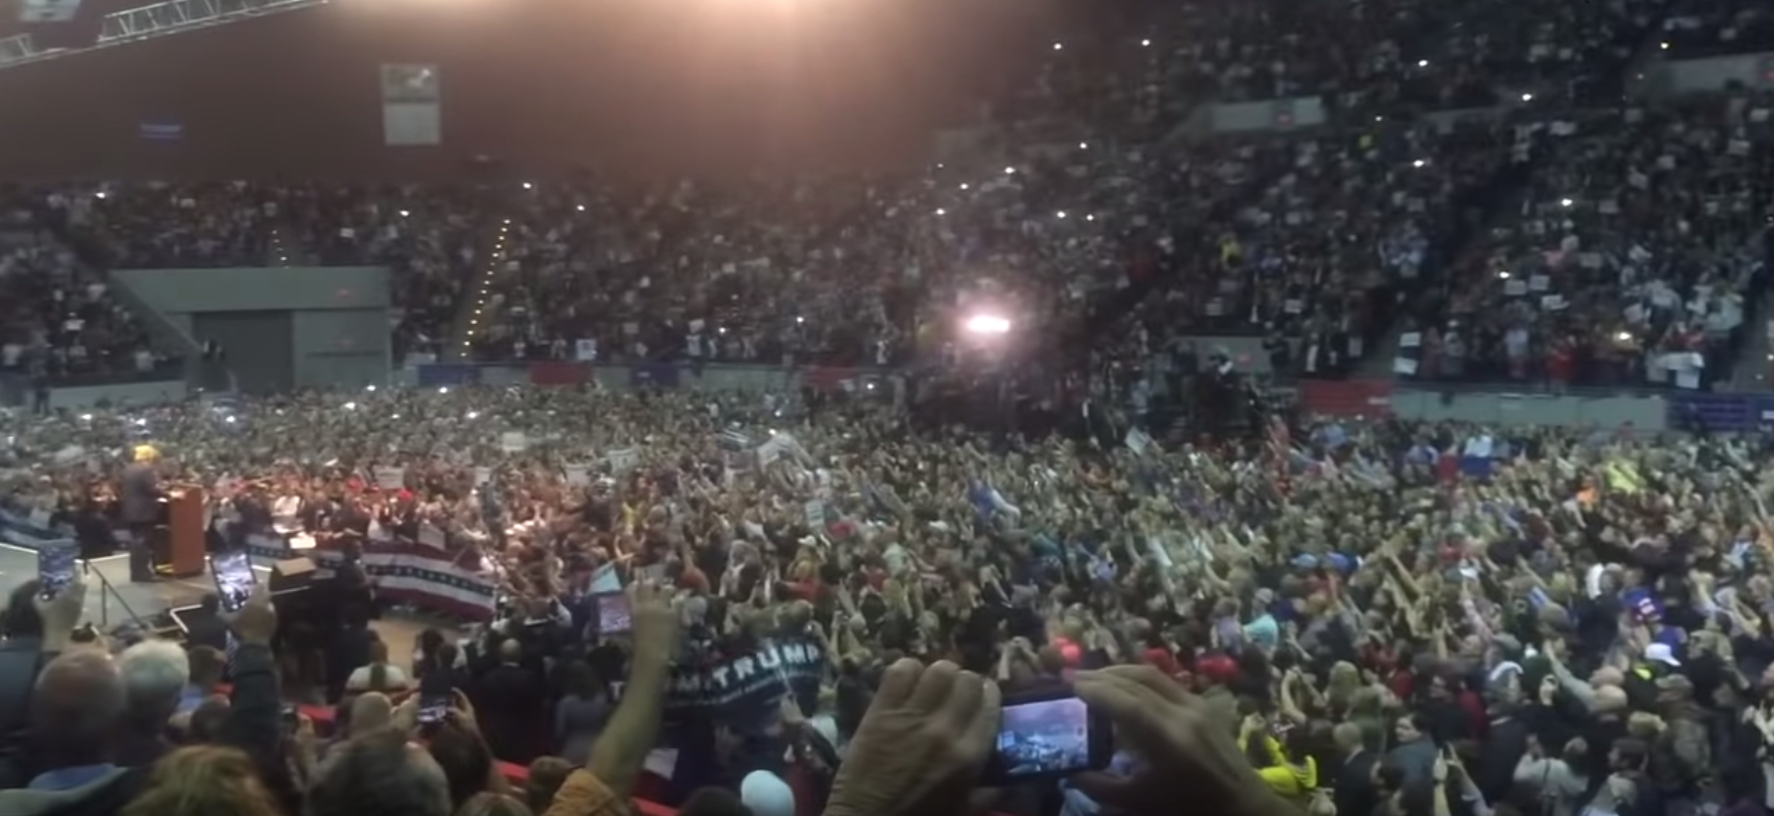 2016年一月,佛羅里達州某一特朗普競選集會。The TRUTH about Donald Trump's Rally- I went to Investigate!! Pensacola, Florida(影片截圖)